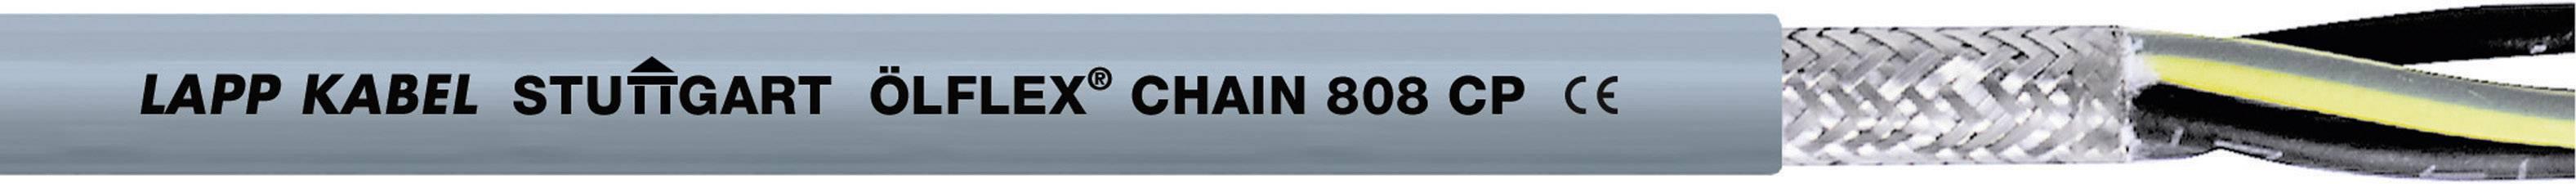 Žíla kabelu LappKabel ÖLFLEX CHAIN 808 CP 18G0,5 (1027757), 18x 0,5 mm², polyurethan, Ø 11,8 mm, stíněný, 100